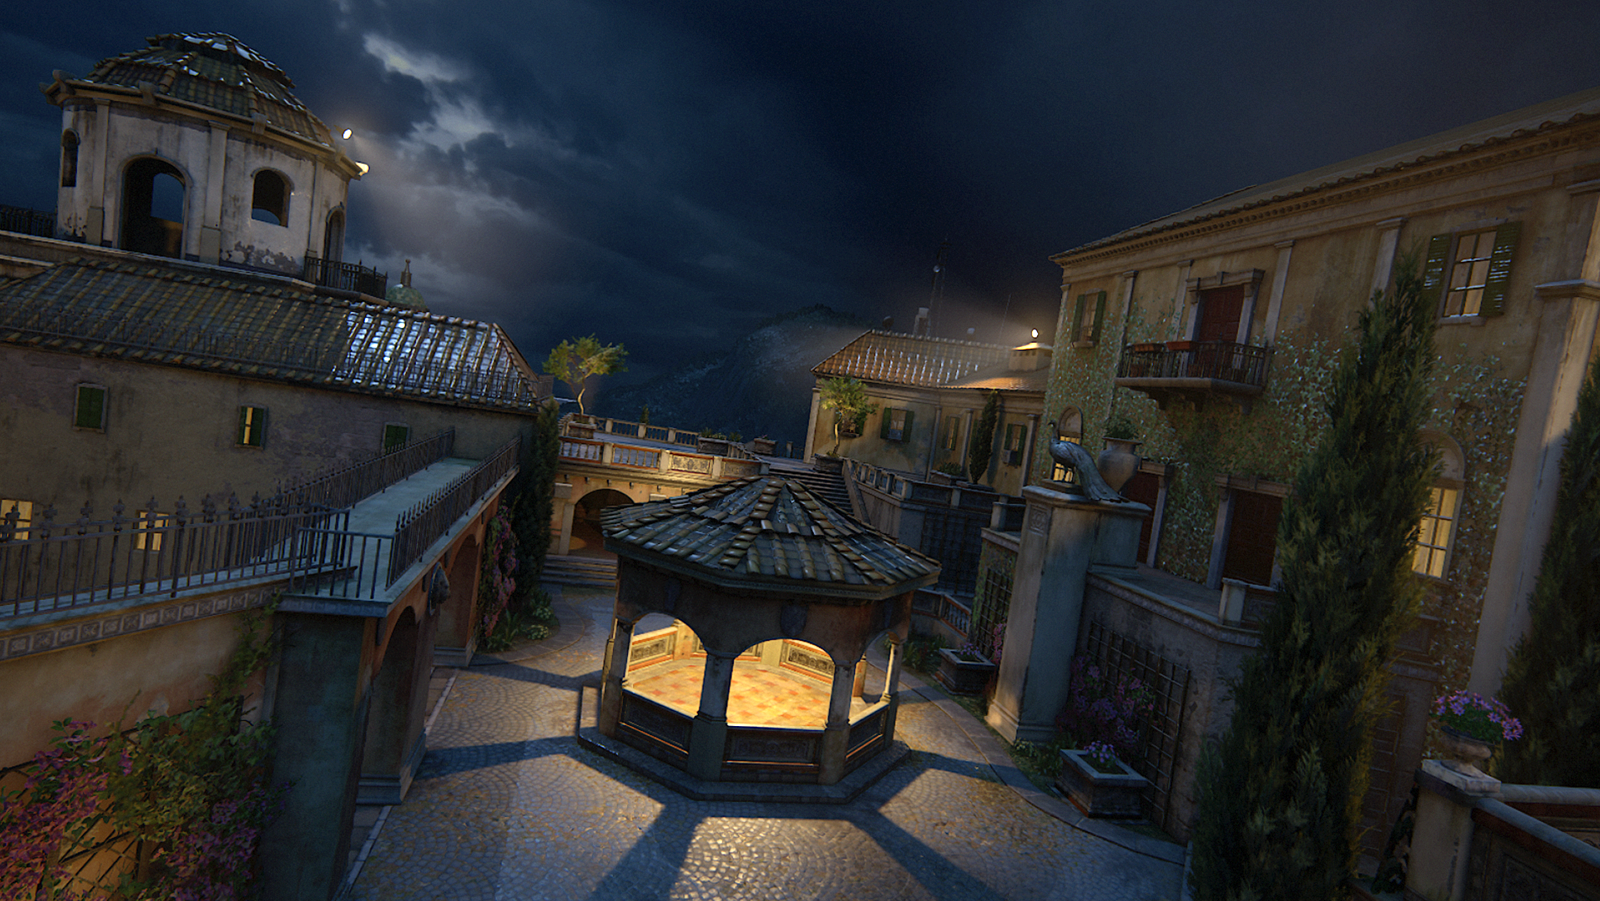 Uncharted4-AThief-sEnd PS4 Editeur 079